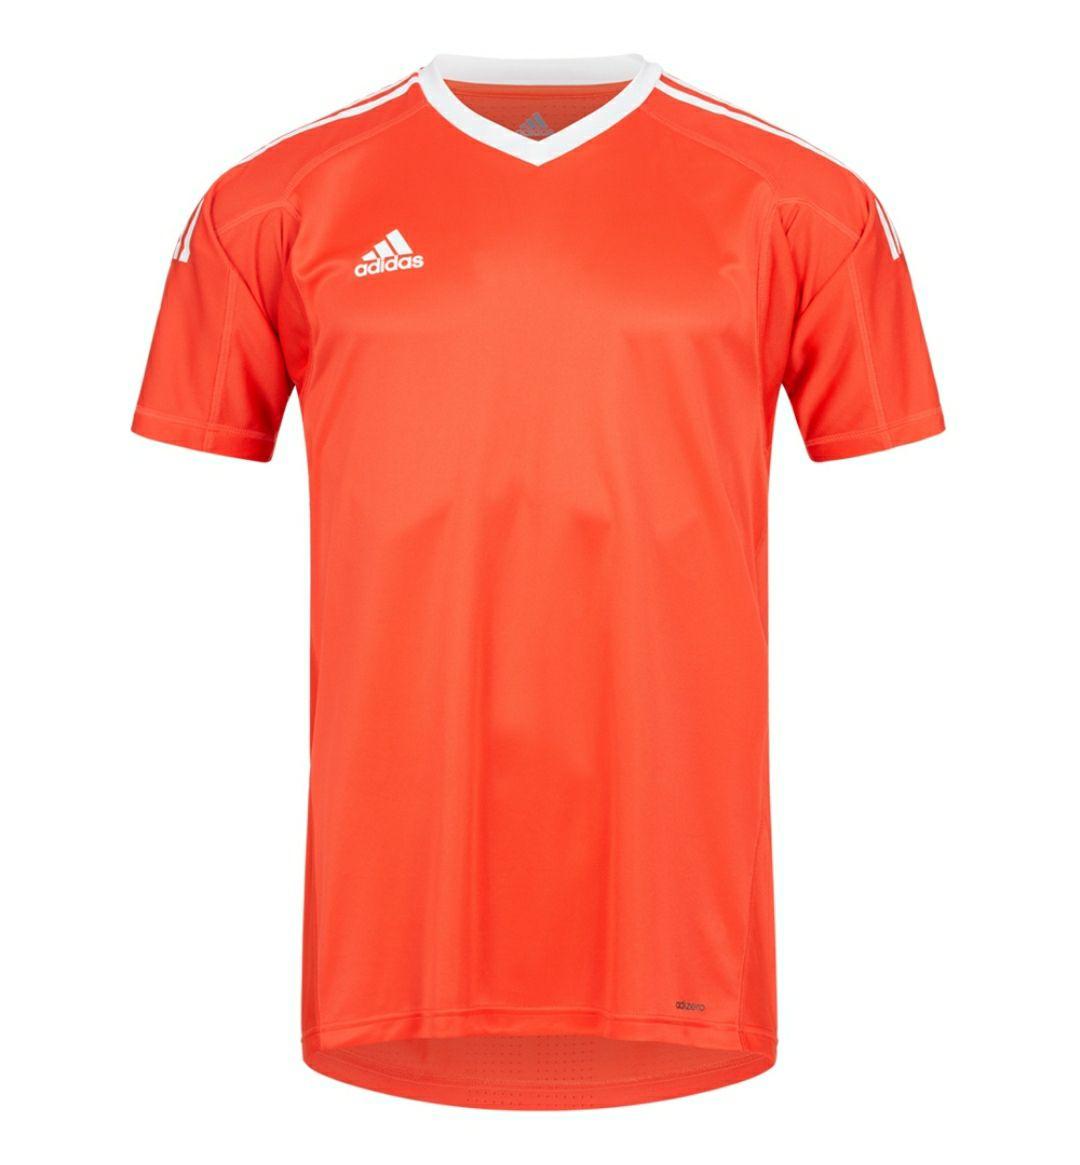 Camiseta Adidas Adizero equipación fútbol jugador o portero